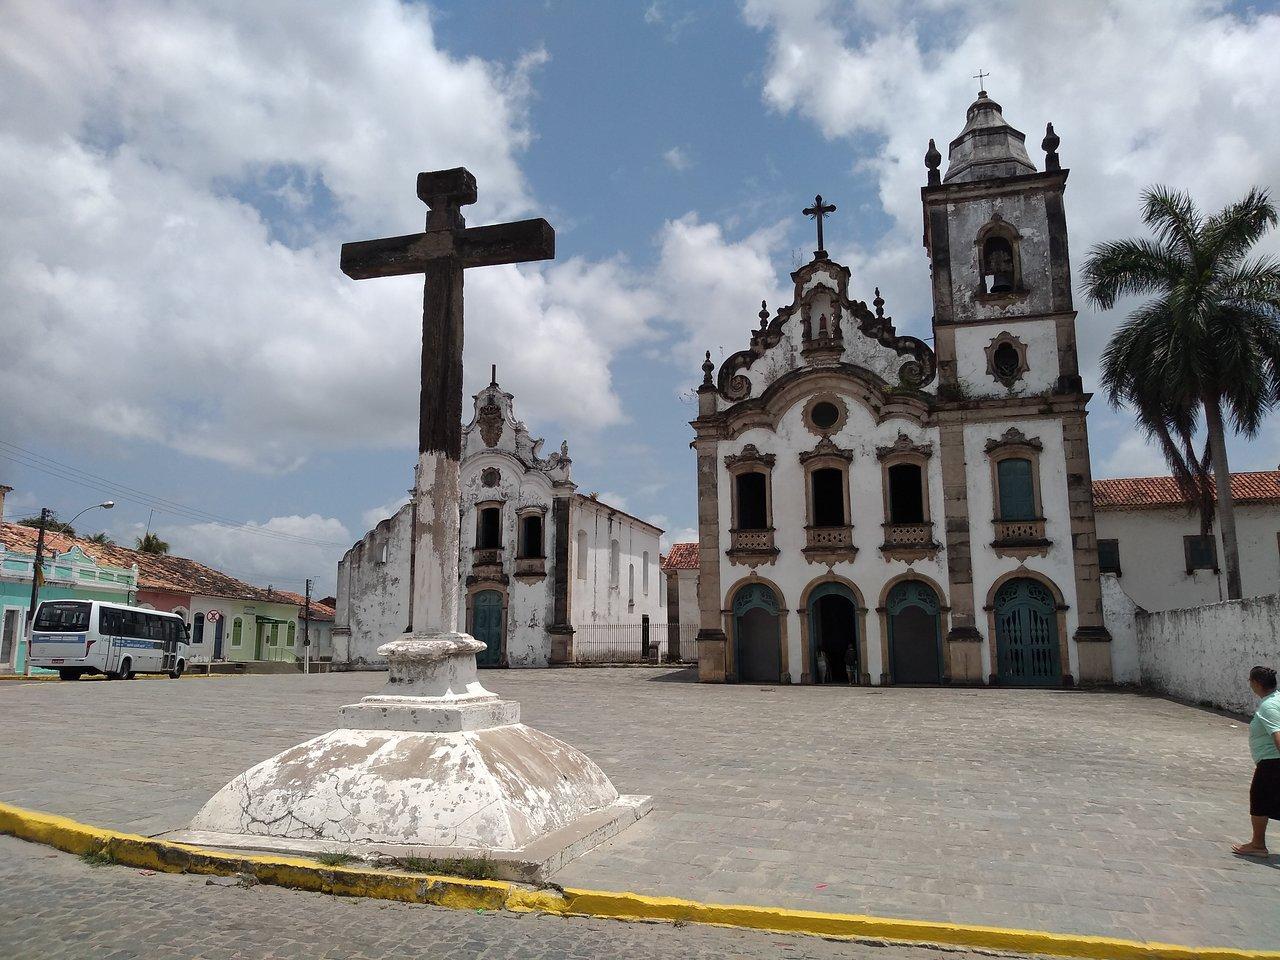 Marechal Deodoro Alagoas fonte: media-cdn.tripadvisor.com